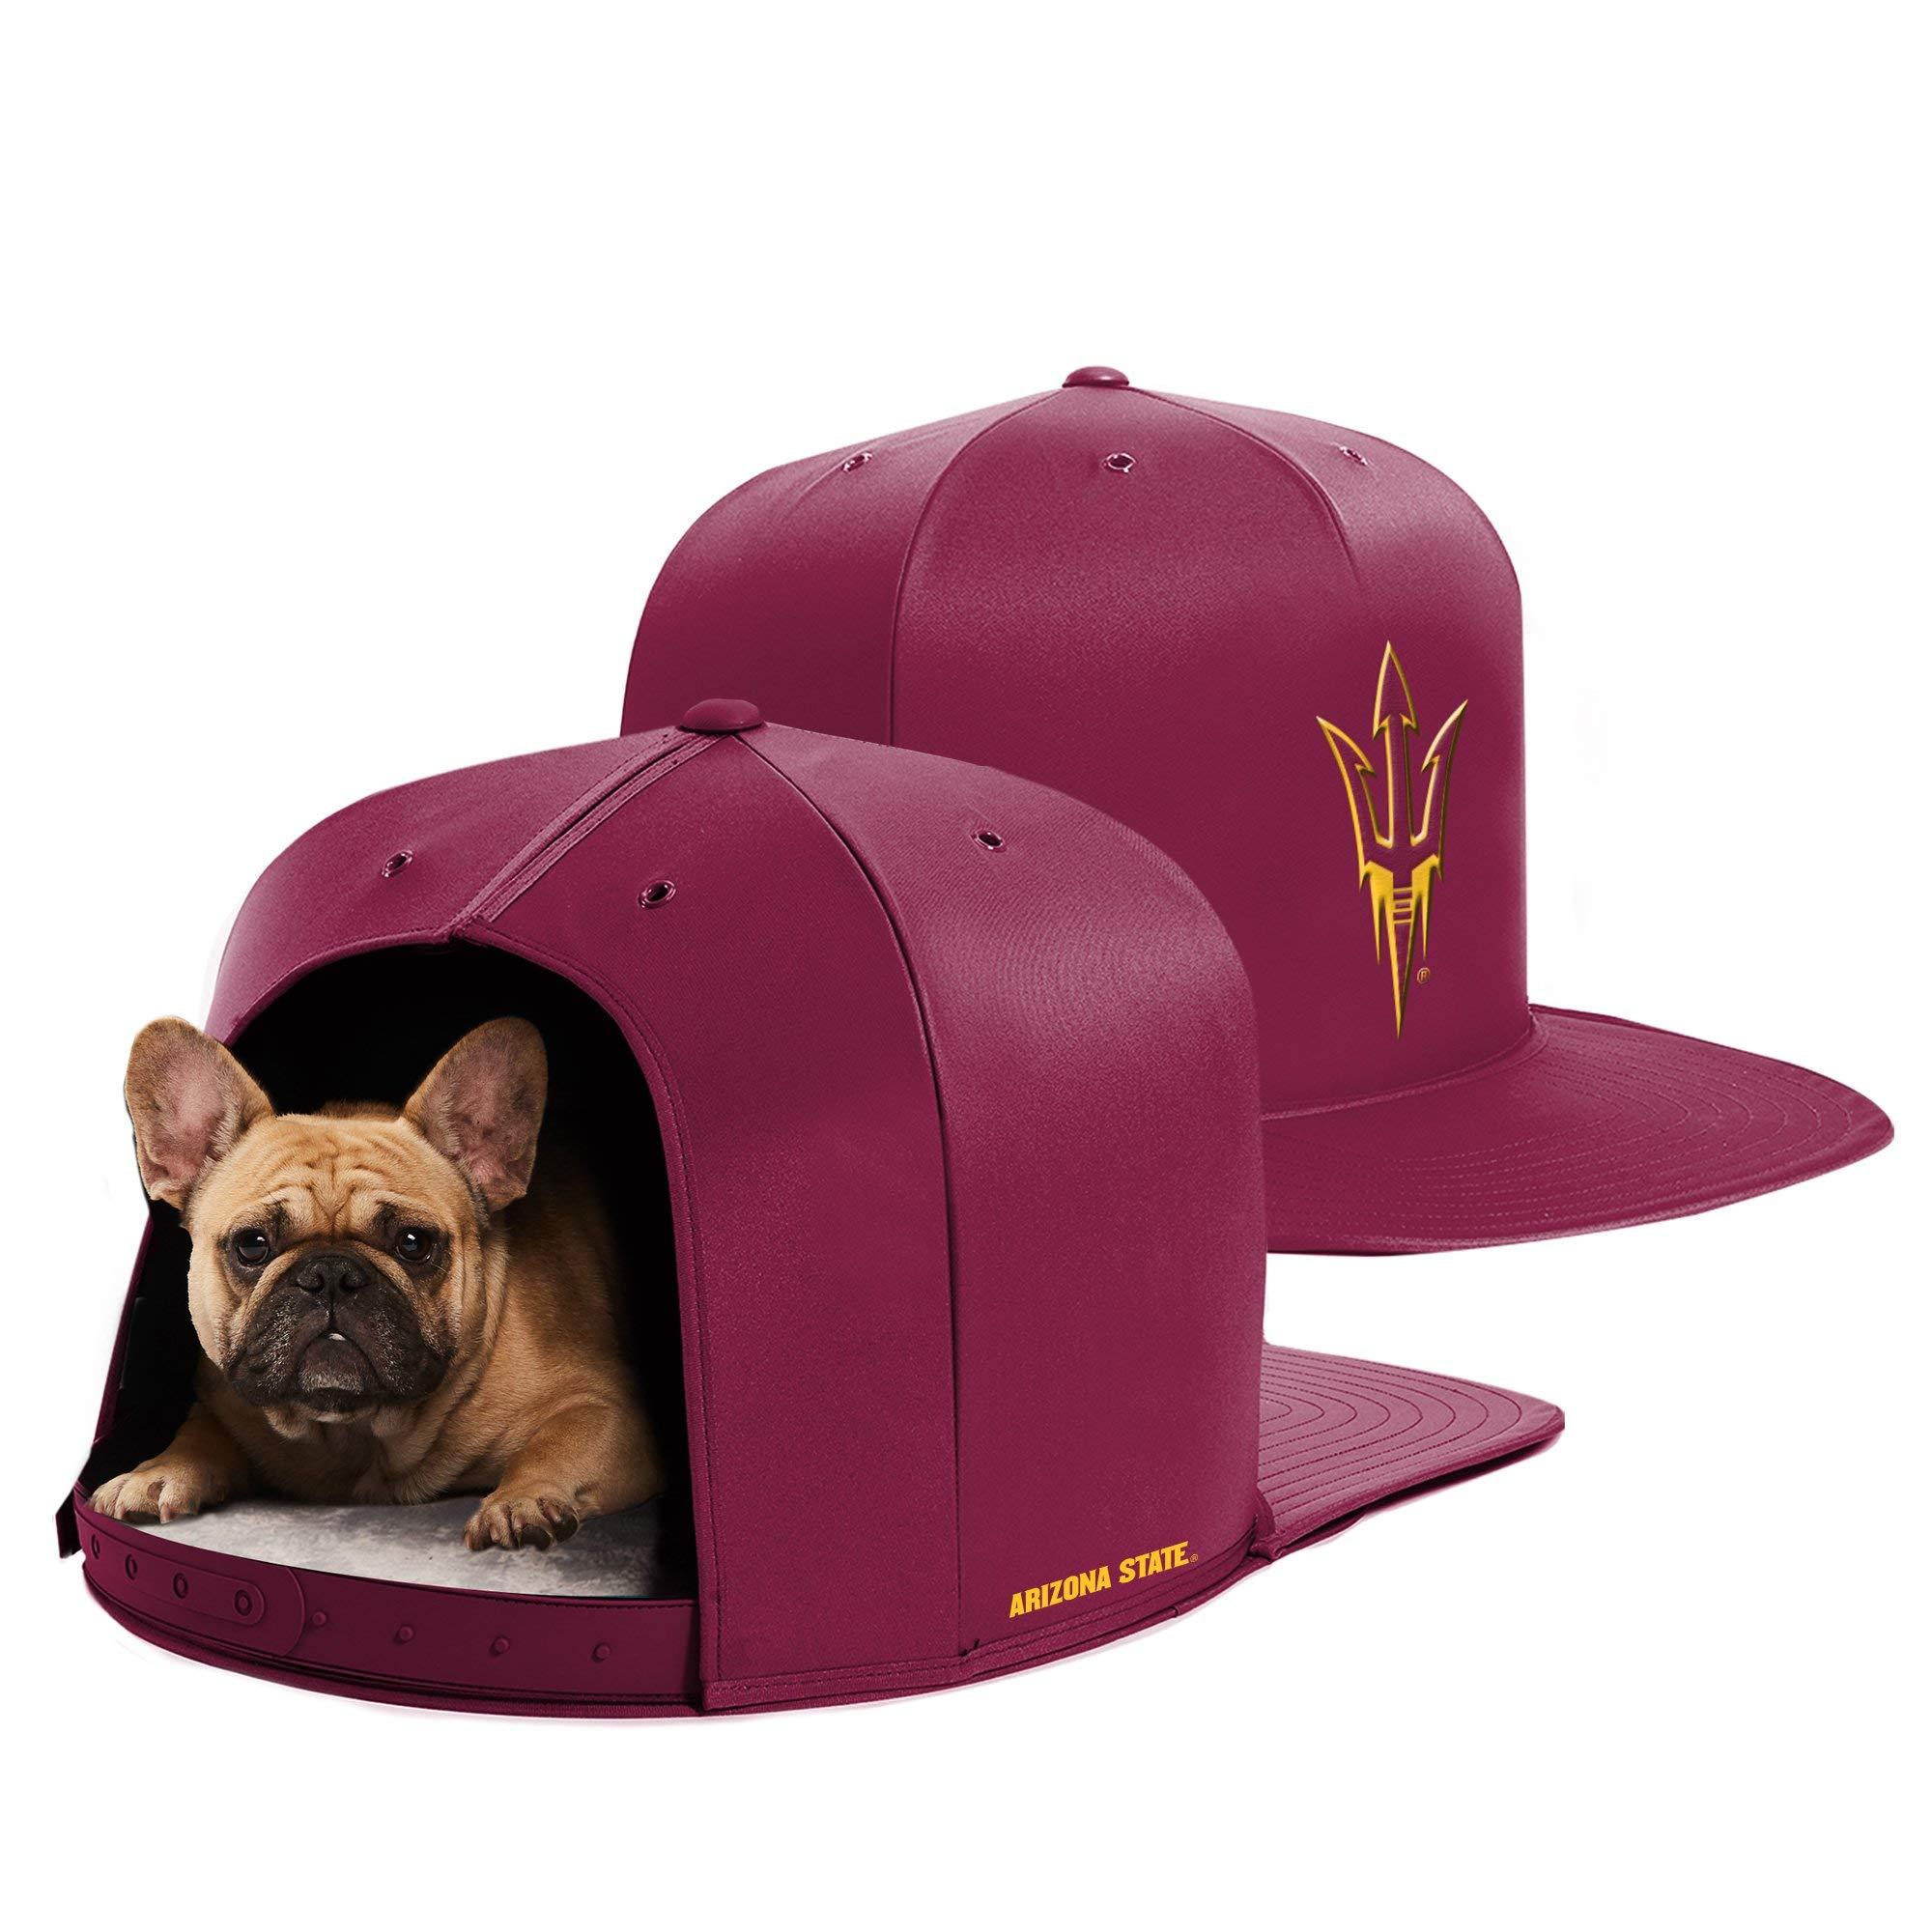 NAP CAP Arizona State University Team Indoor Pet Bed (Large) by NAP CAP (Image #1)